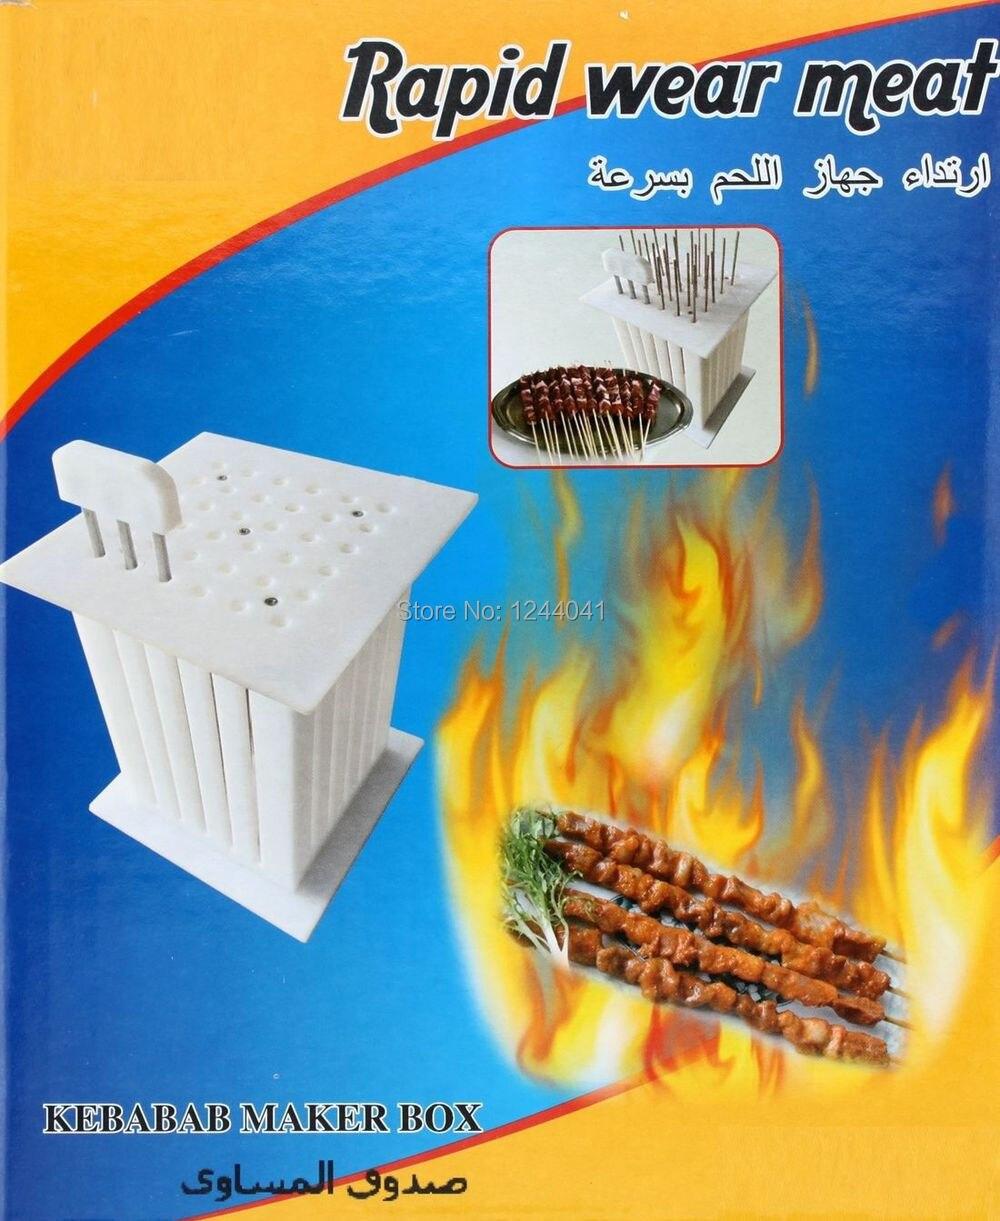 шашлык на шампур машина